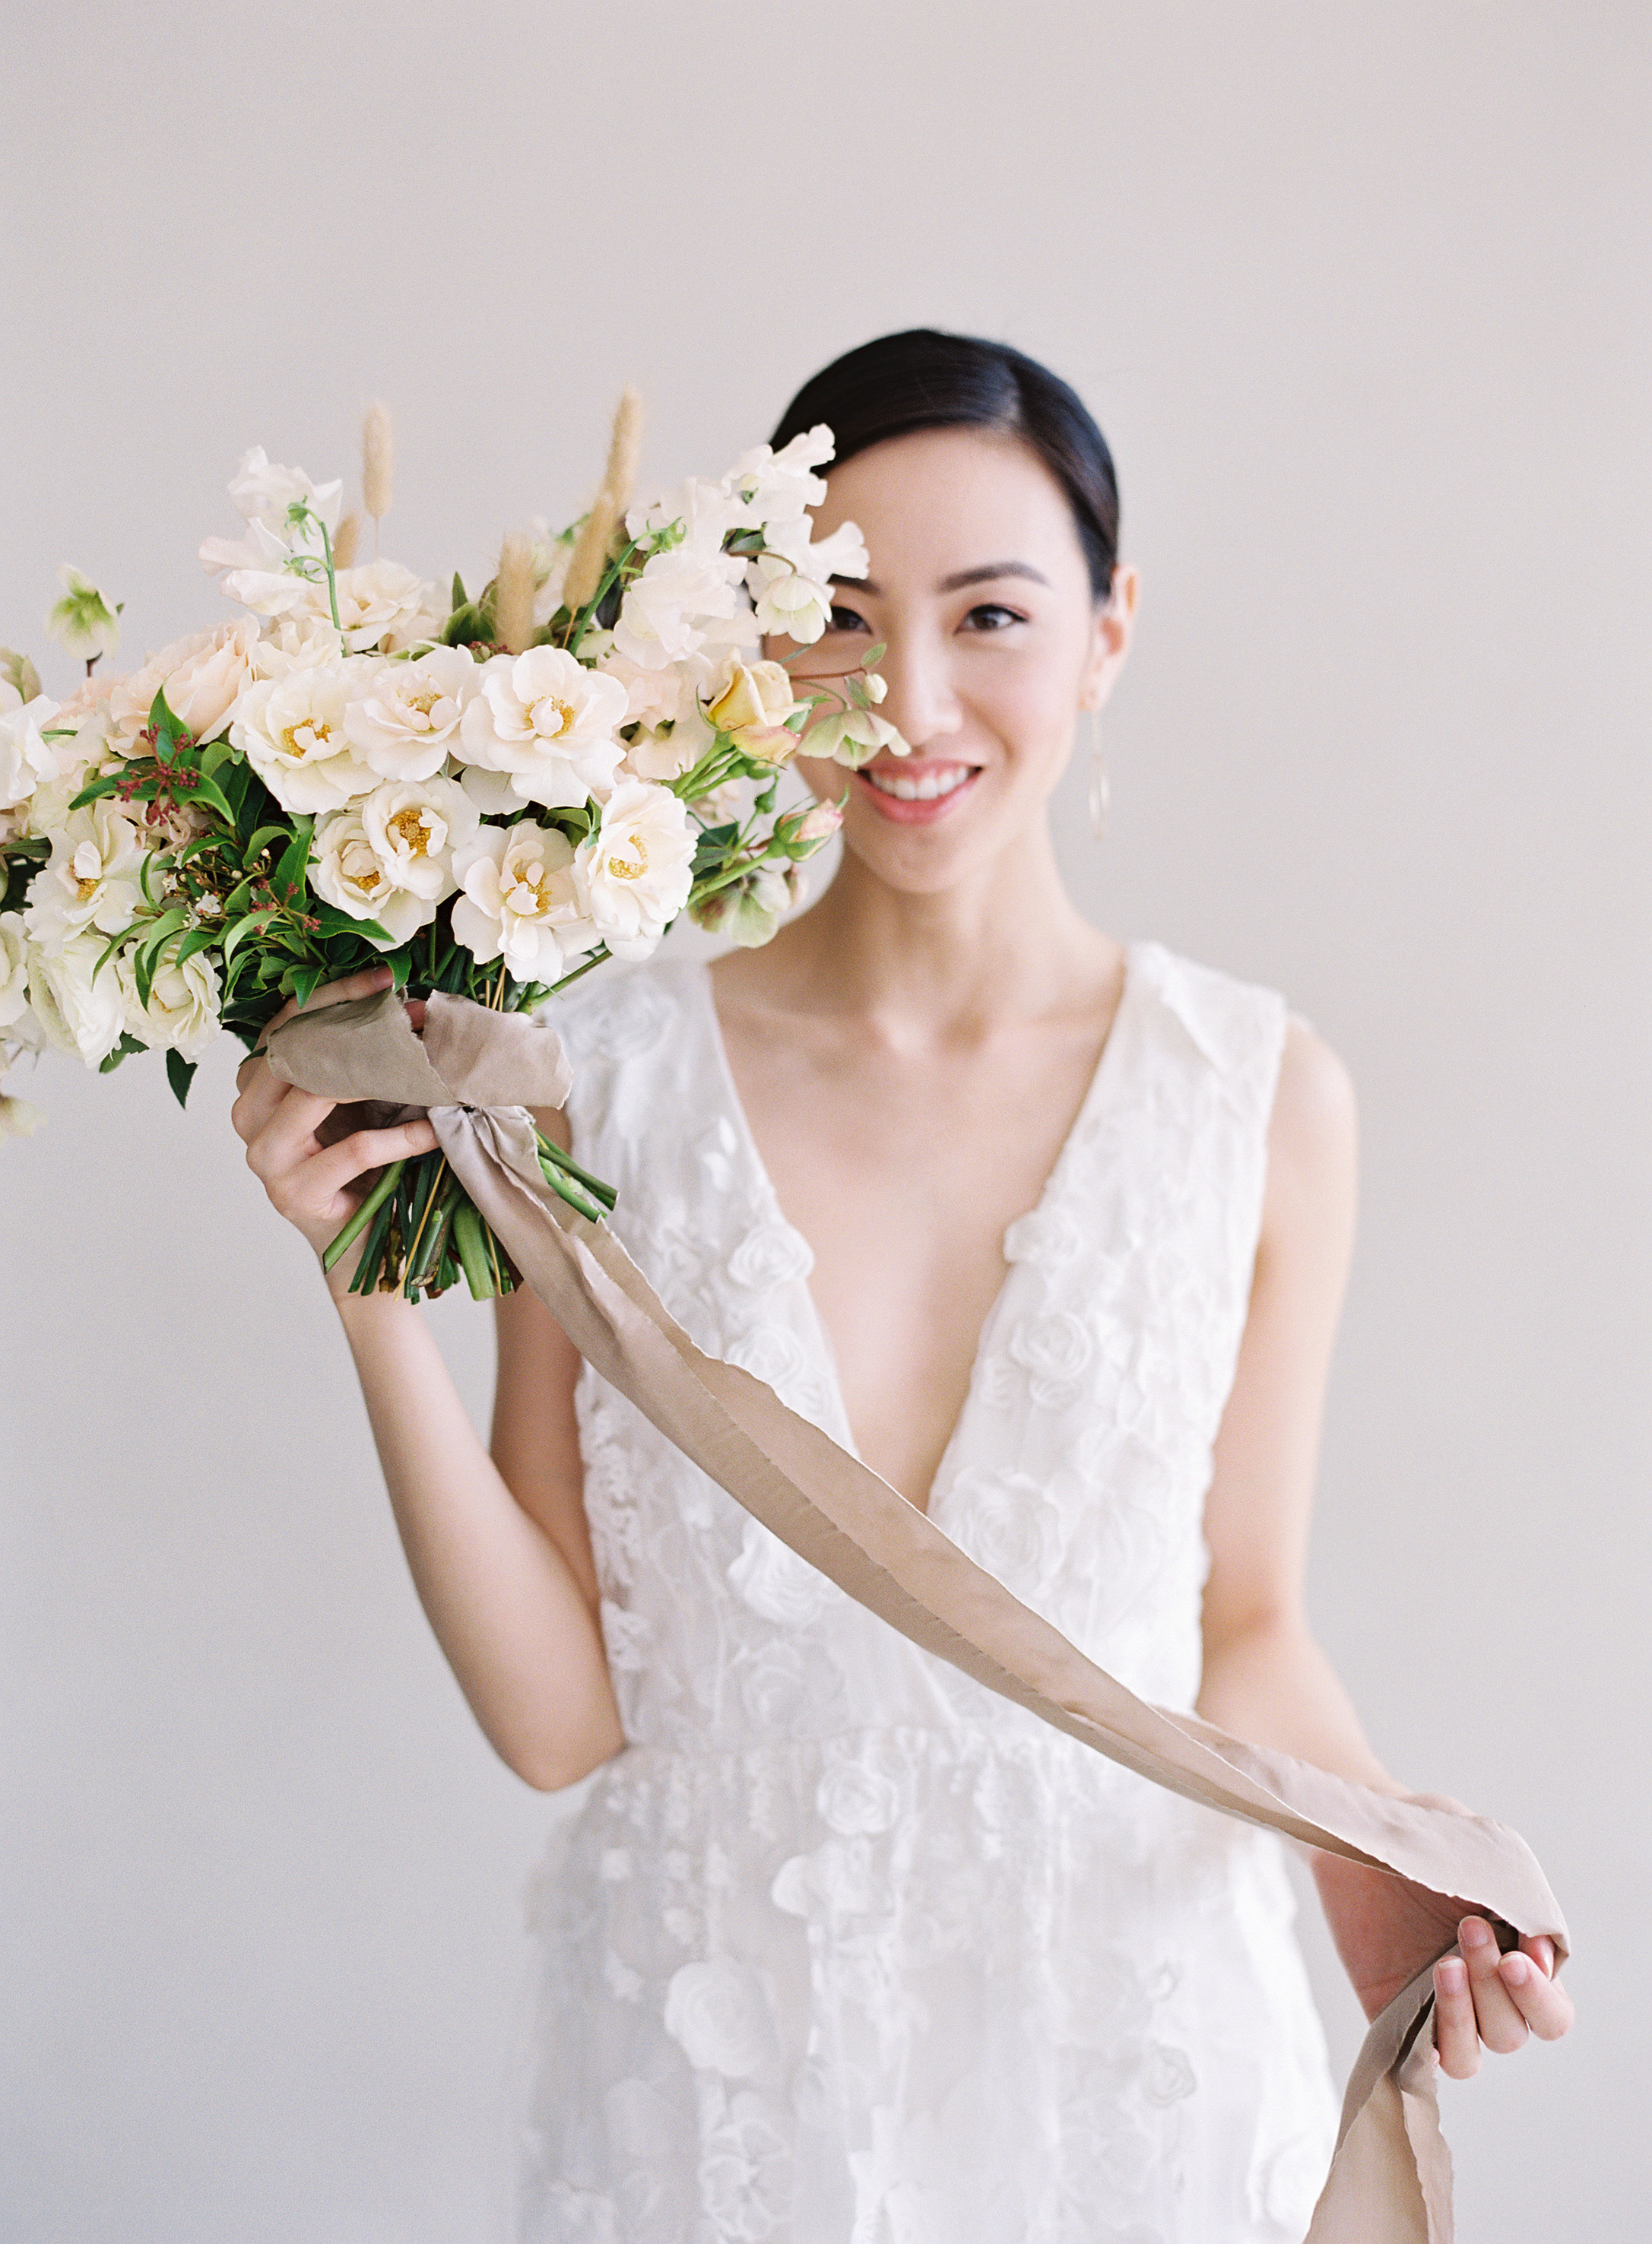 101-Wedding_Bouquet_by_Ellamah-Photo_by_Christine_Donee-Gown_by_Halfpenny_London.jpg